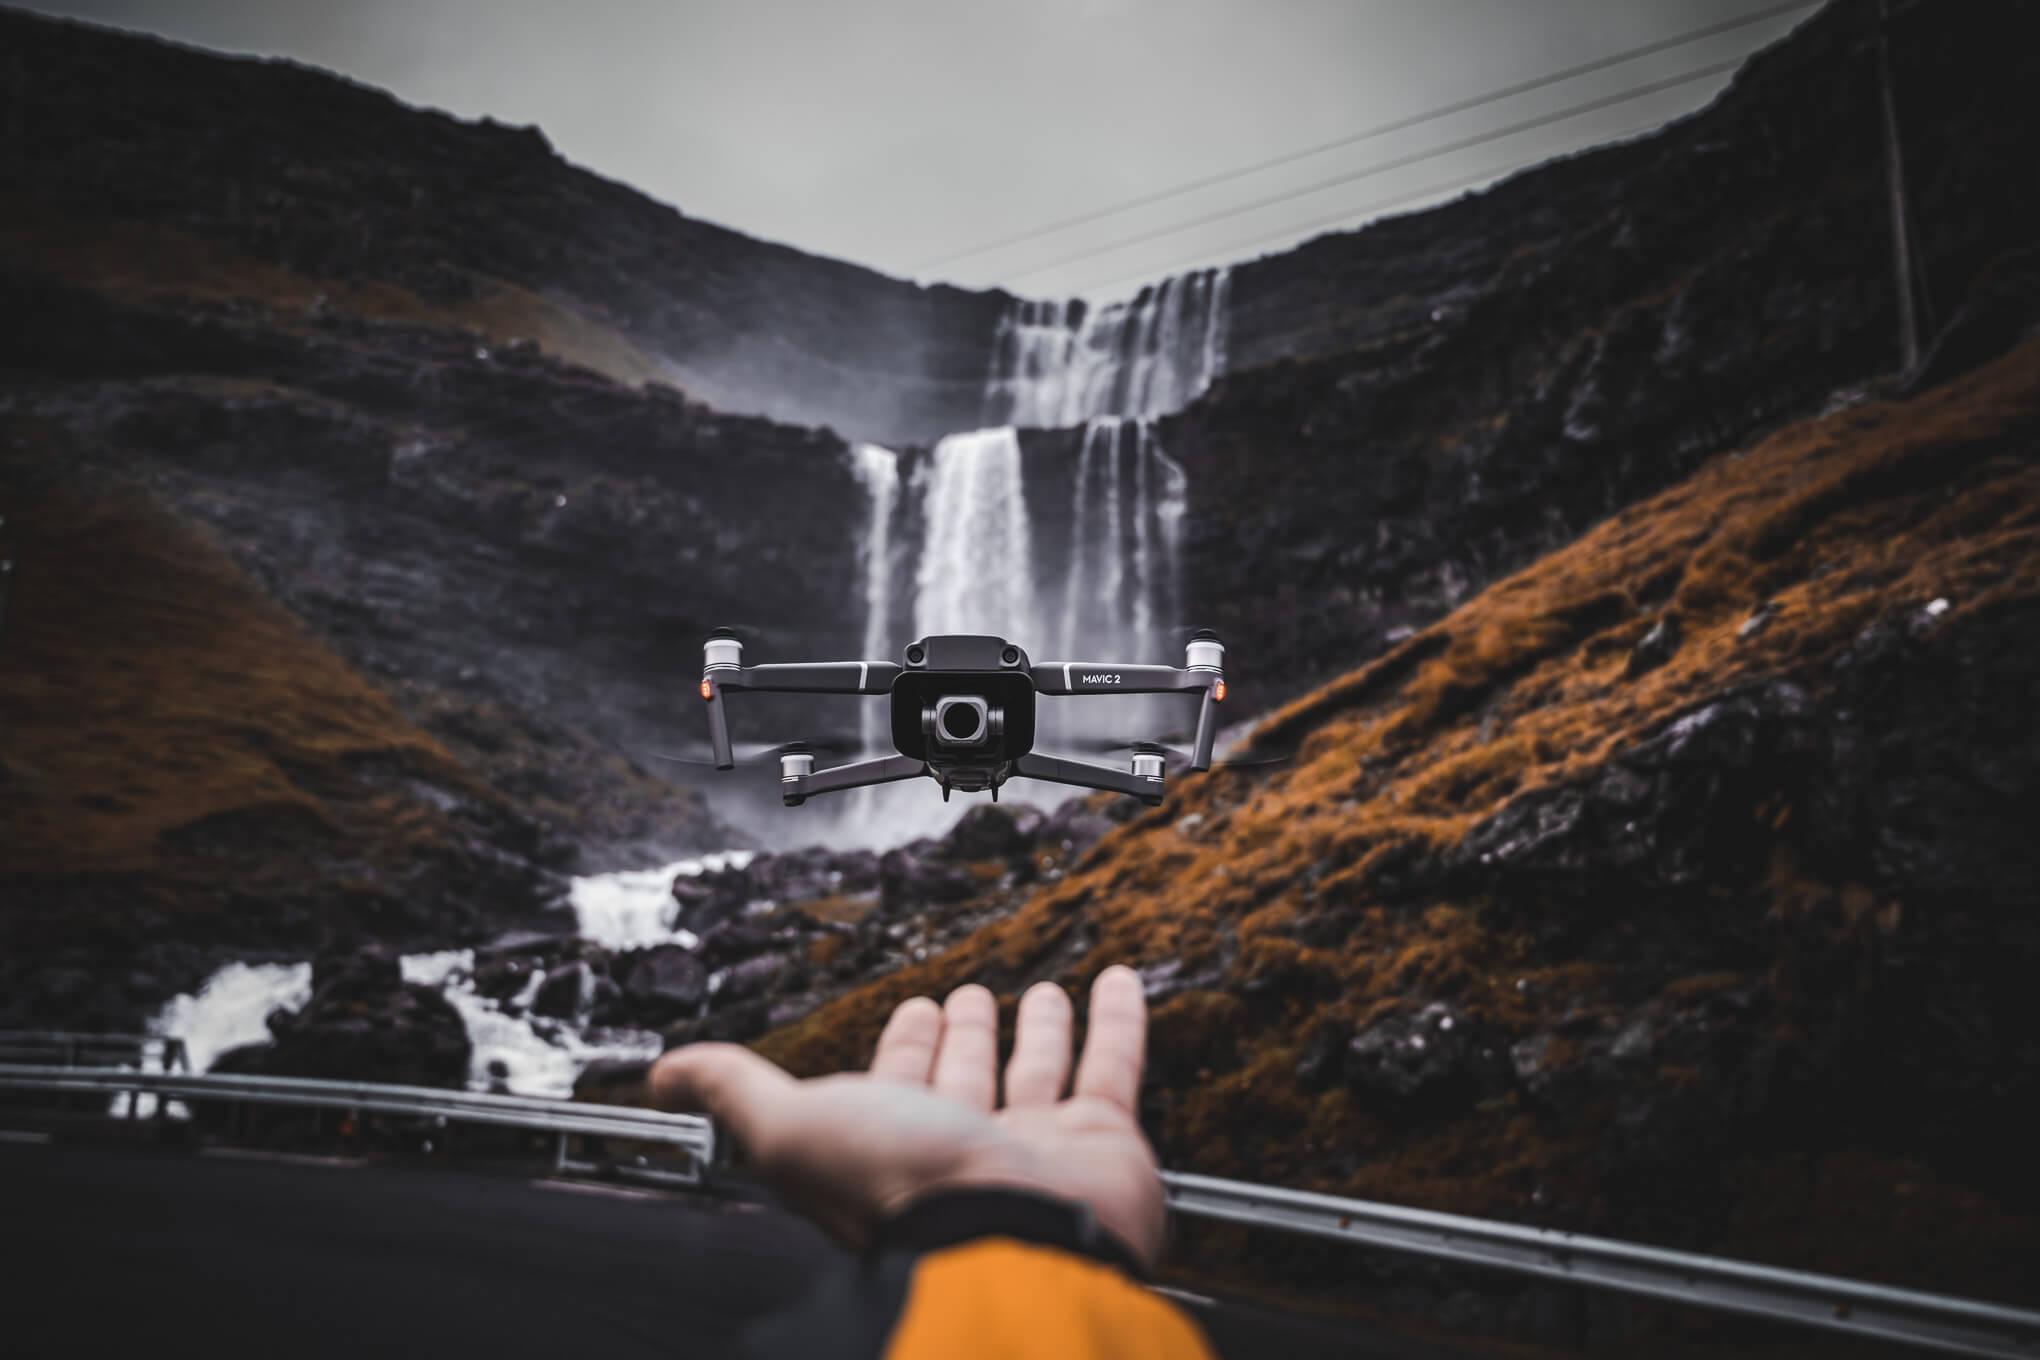 landscpae_paltenghi_claudio_photography27 🇫🇴Faroeisland Road Trip🇫🇴 Blog Landscape